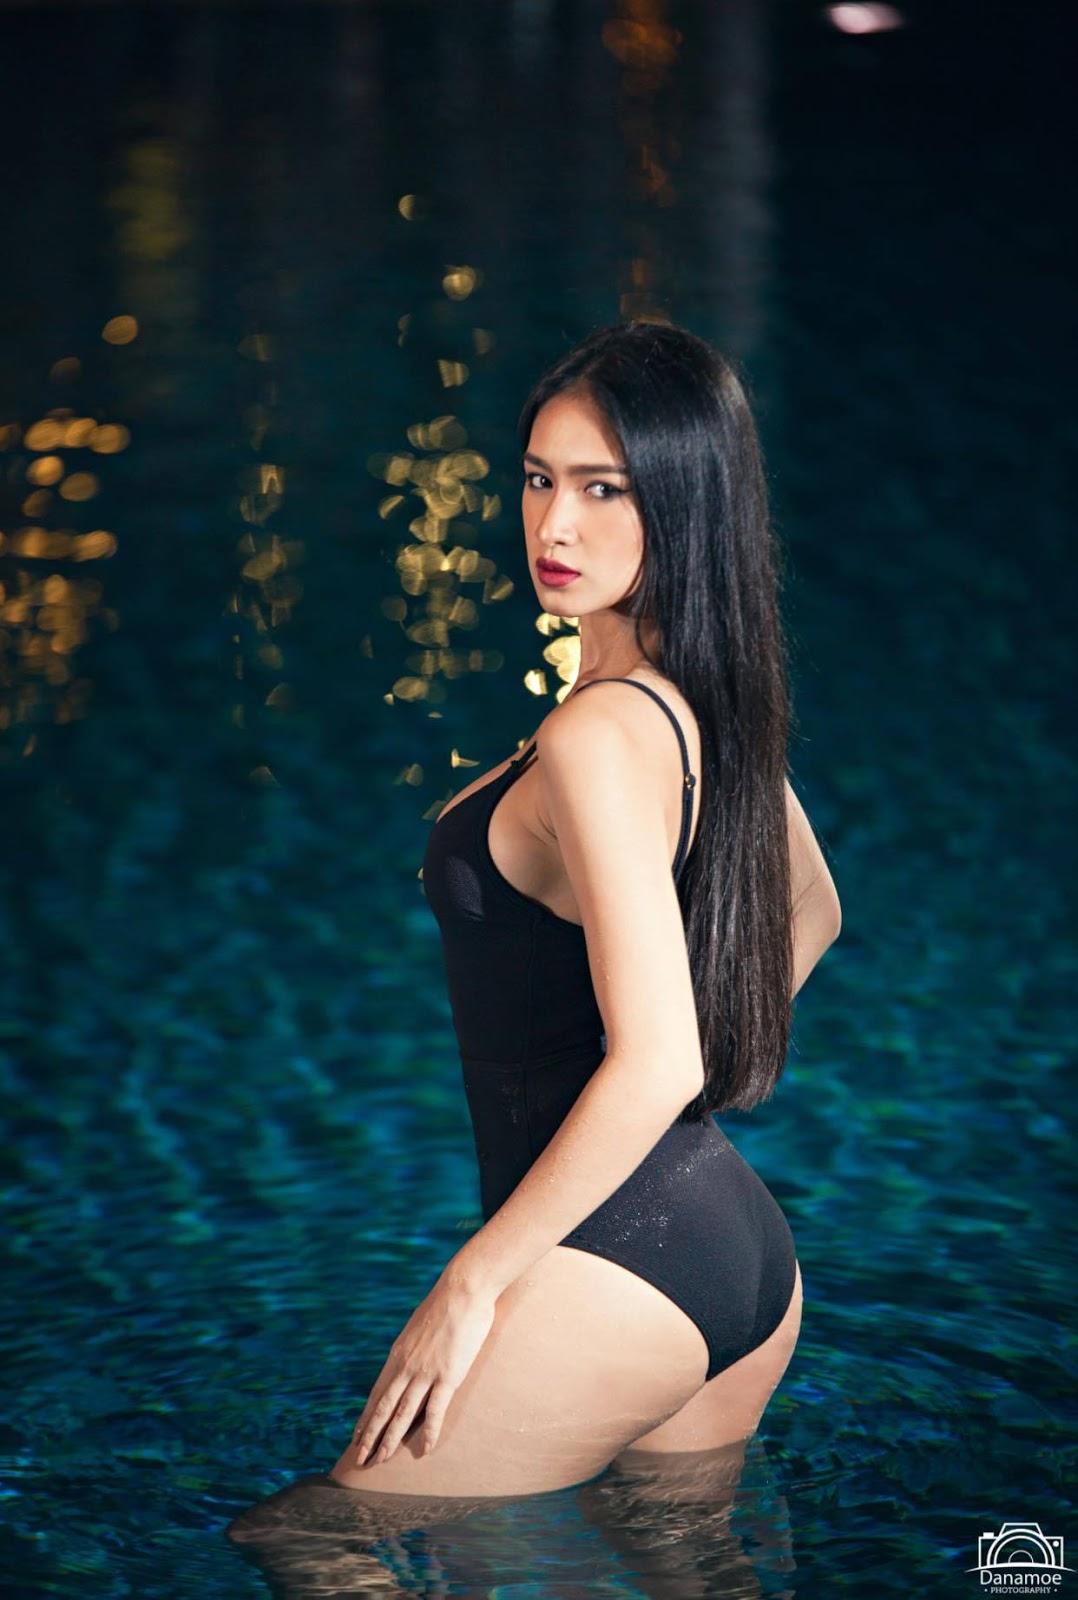 Miss Grand Myanmar 2017 : Shwe Eain Si Swim Suit Fashion Photoshoot